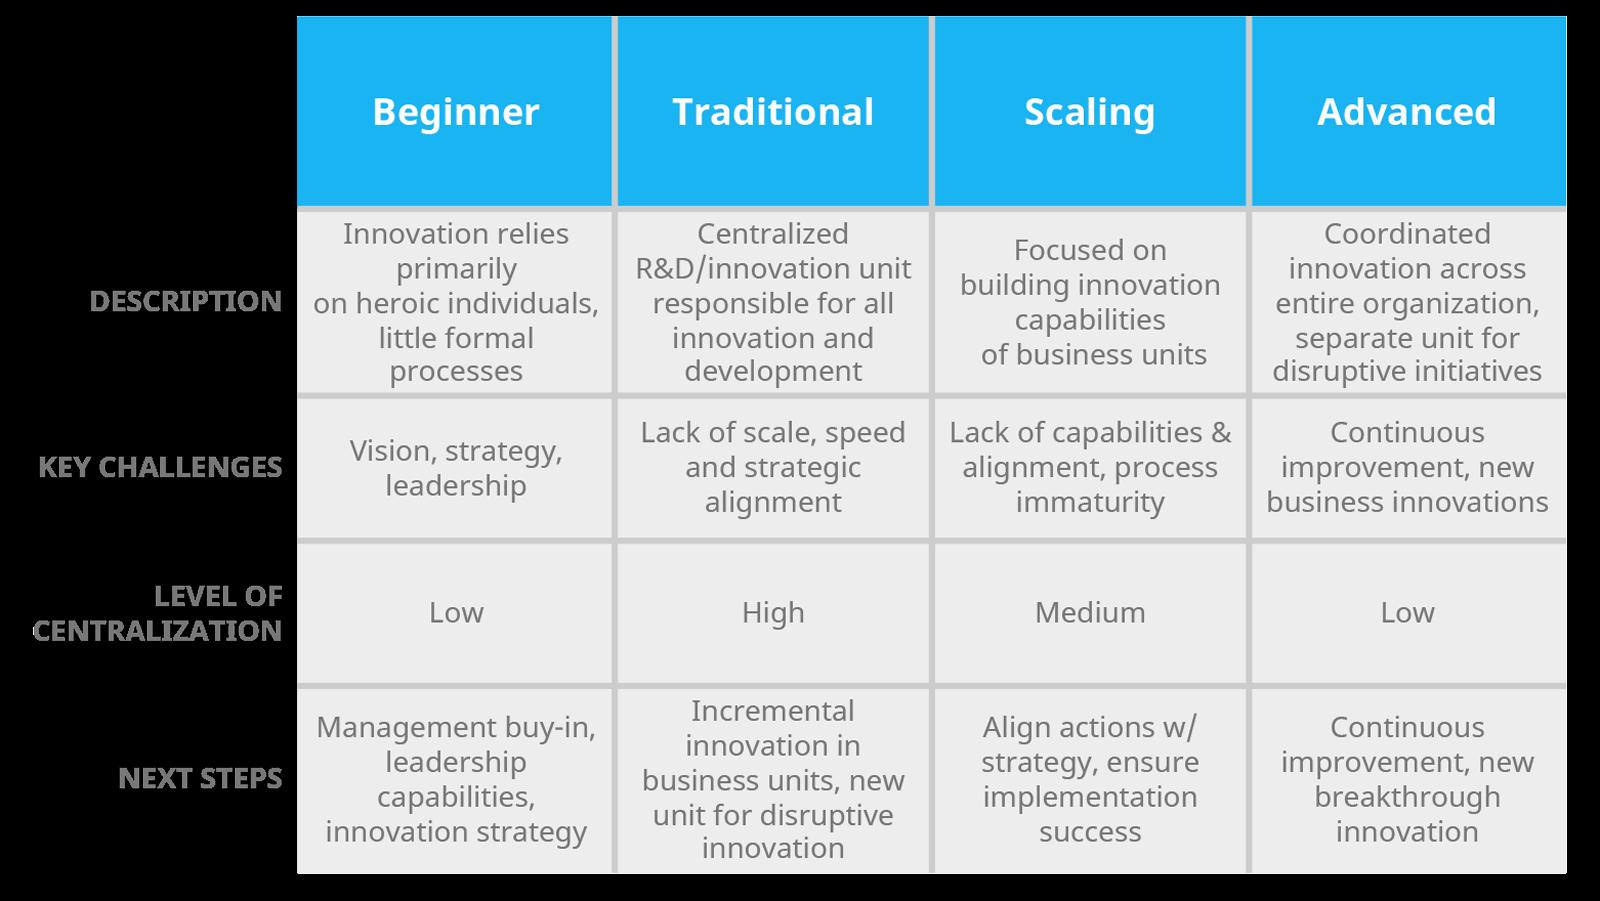 The Innovation Maturity Matrix explained